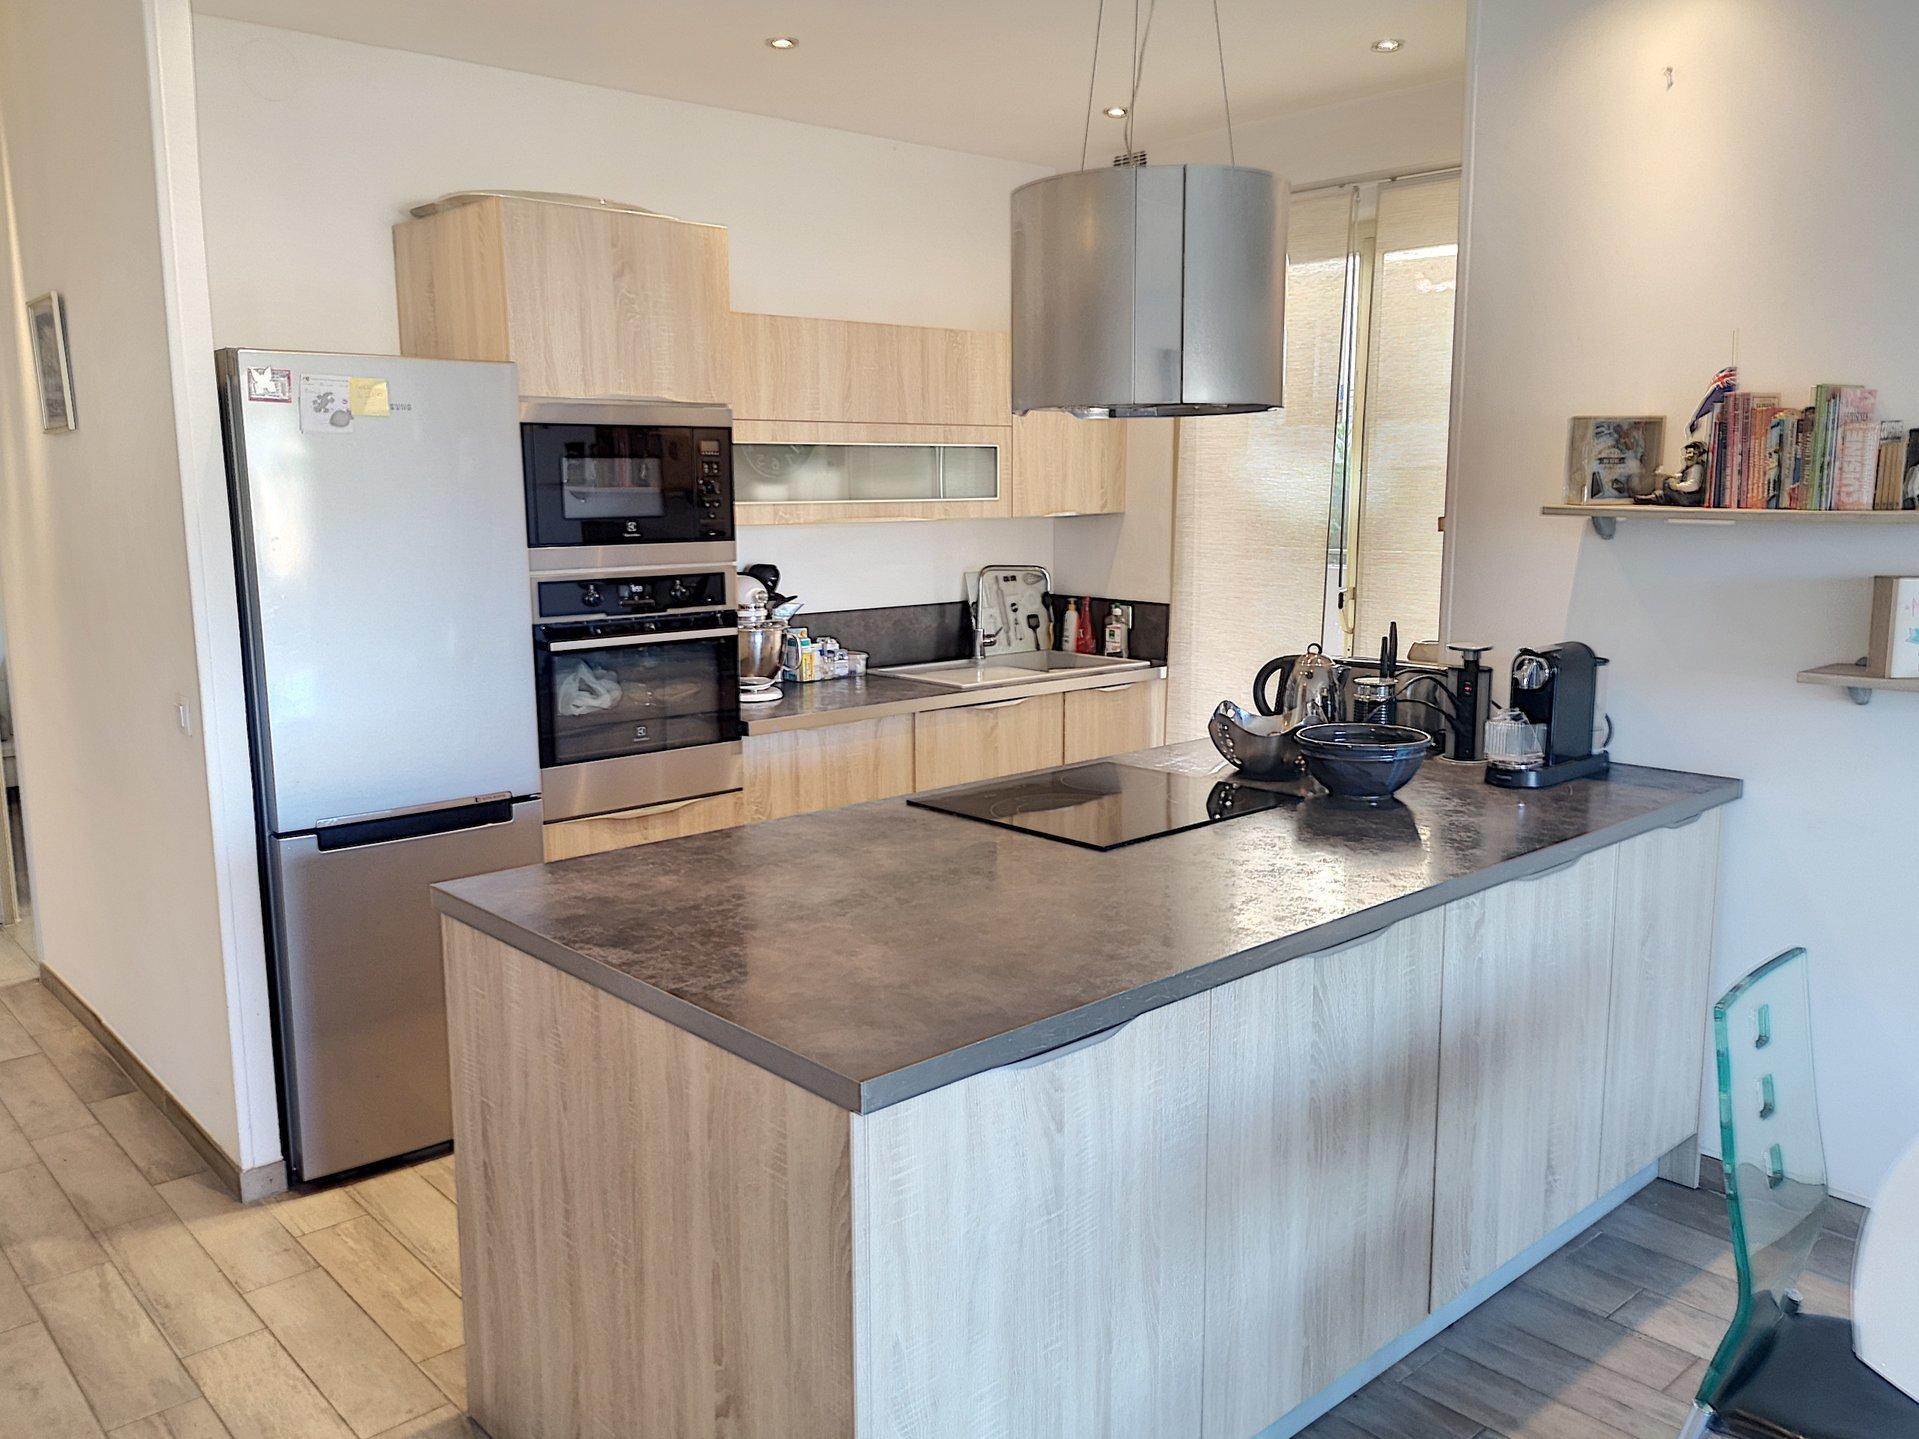 Kitchen island, stainless steel